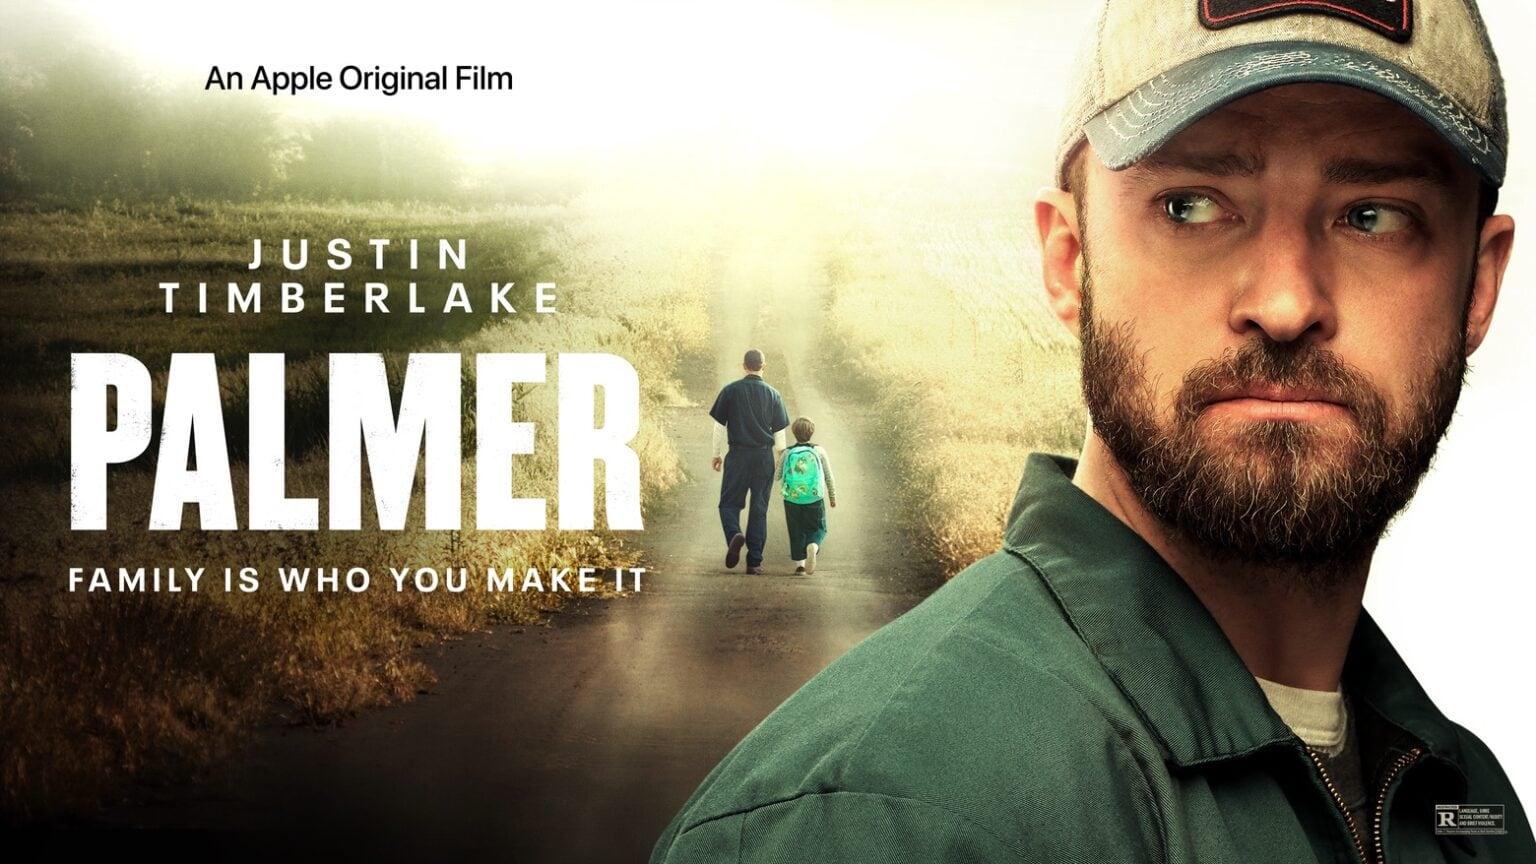 Justin Timberlake's Palmer brings huge Apple TV+ viewership spike